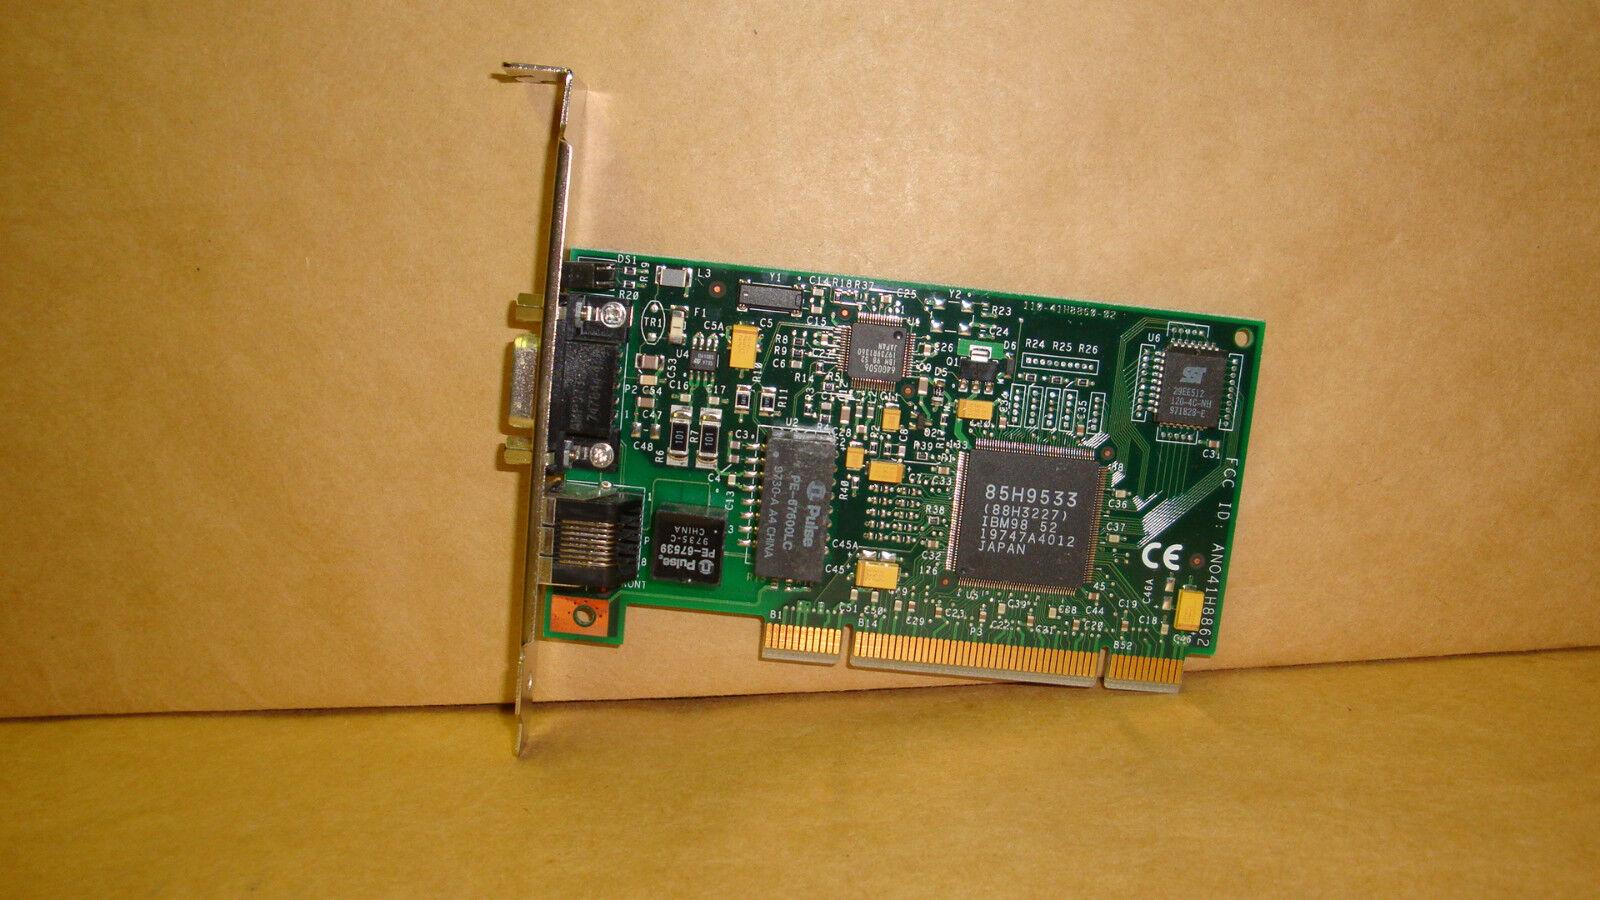 IBM PCI TOKEN-RING ETHERNET CARD TESTED OK